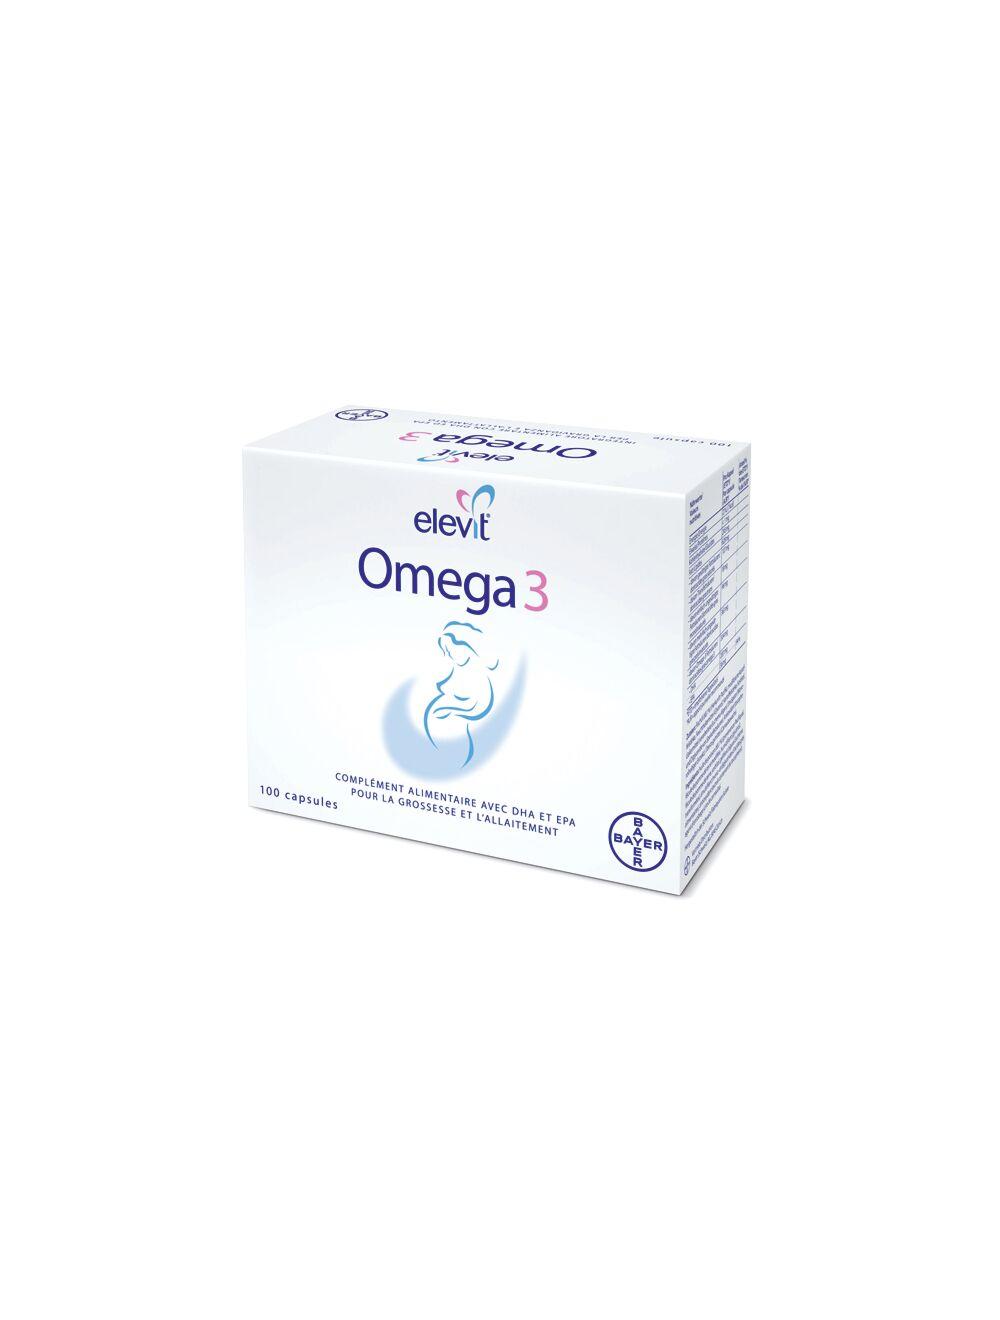 elevit omega 3 100 capsules